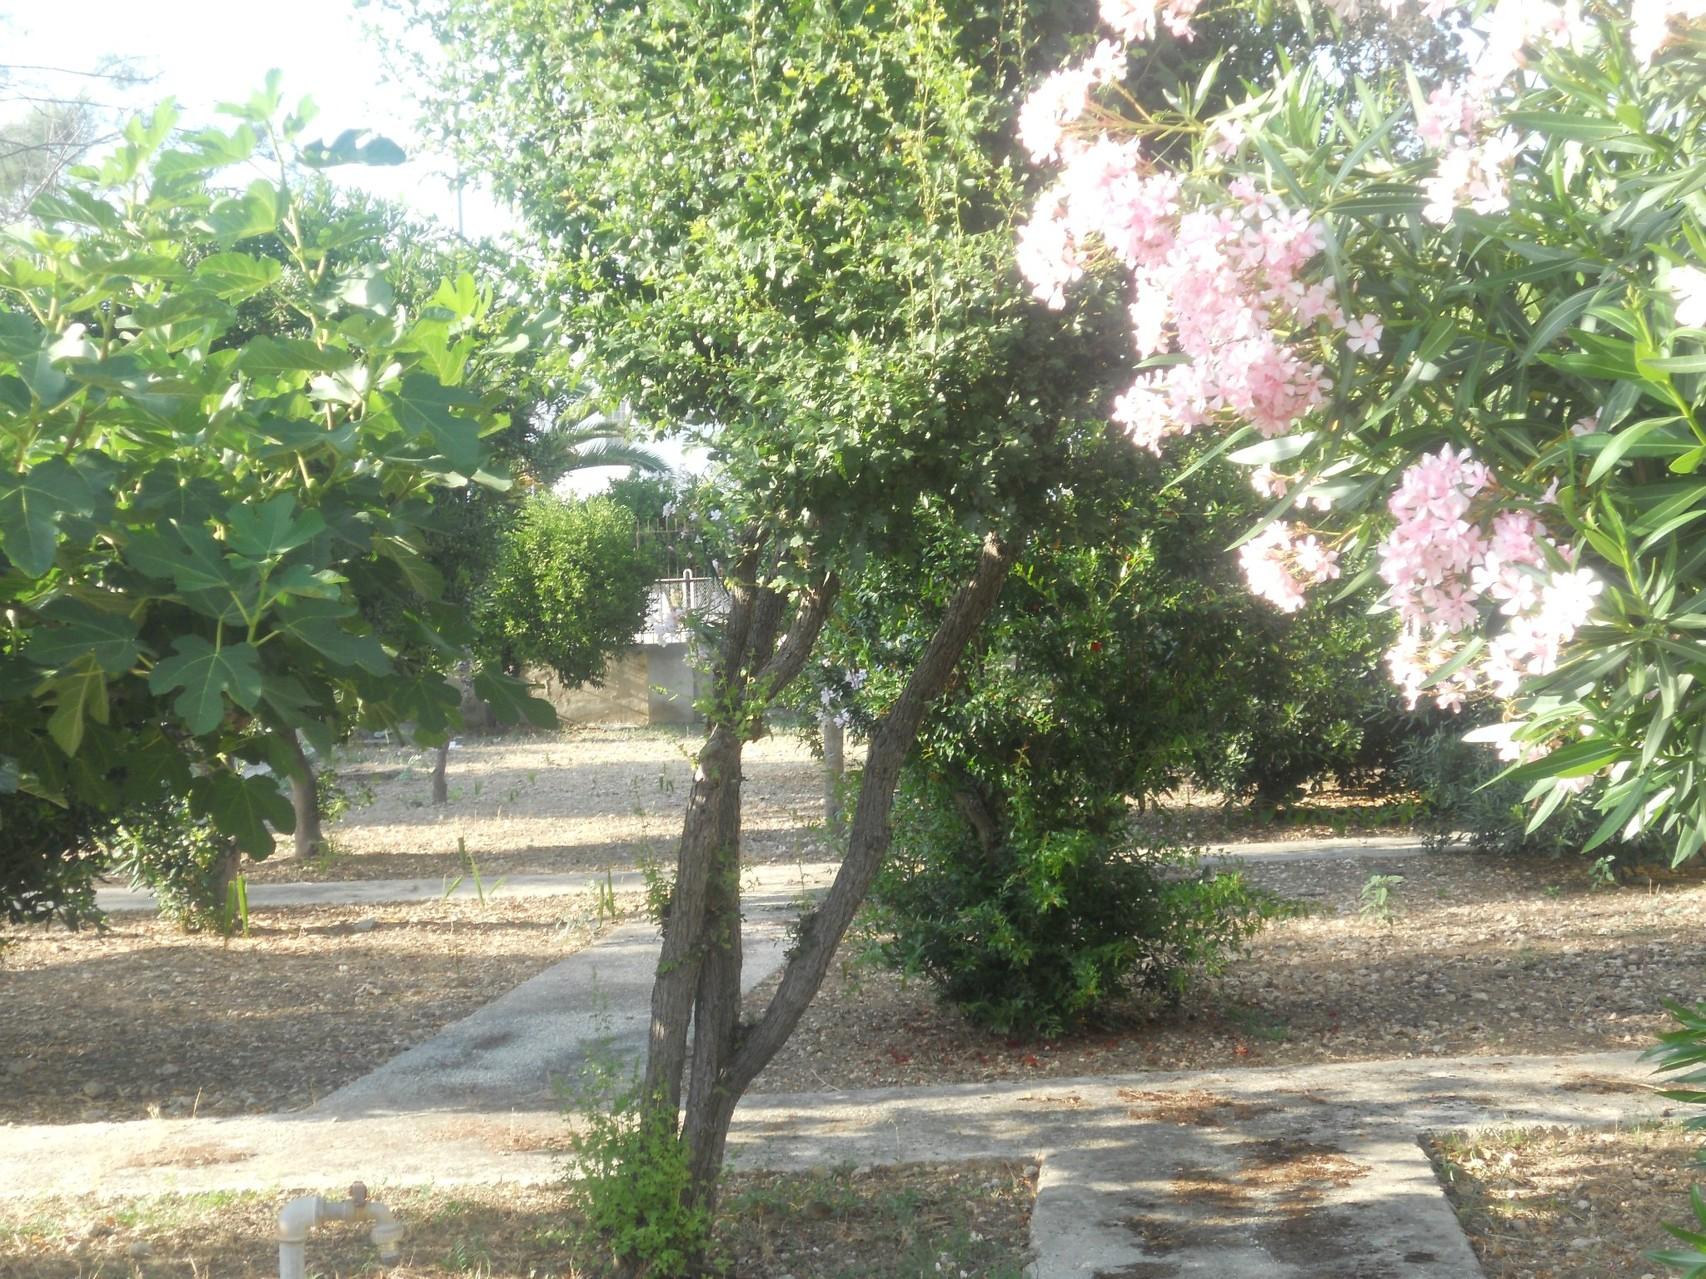 Angolo del giardino.